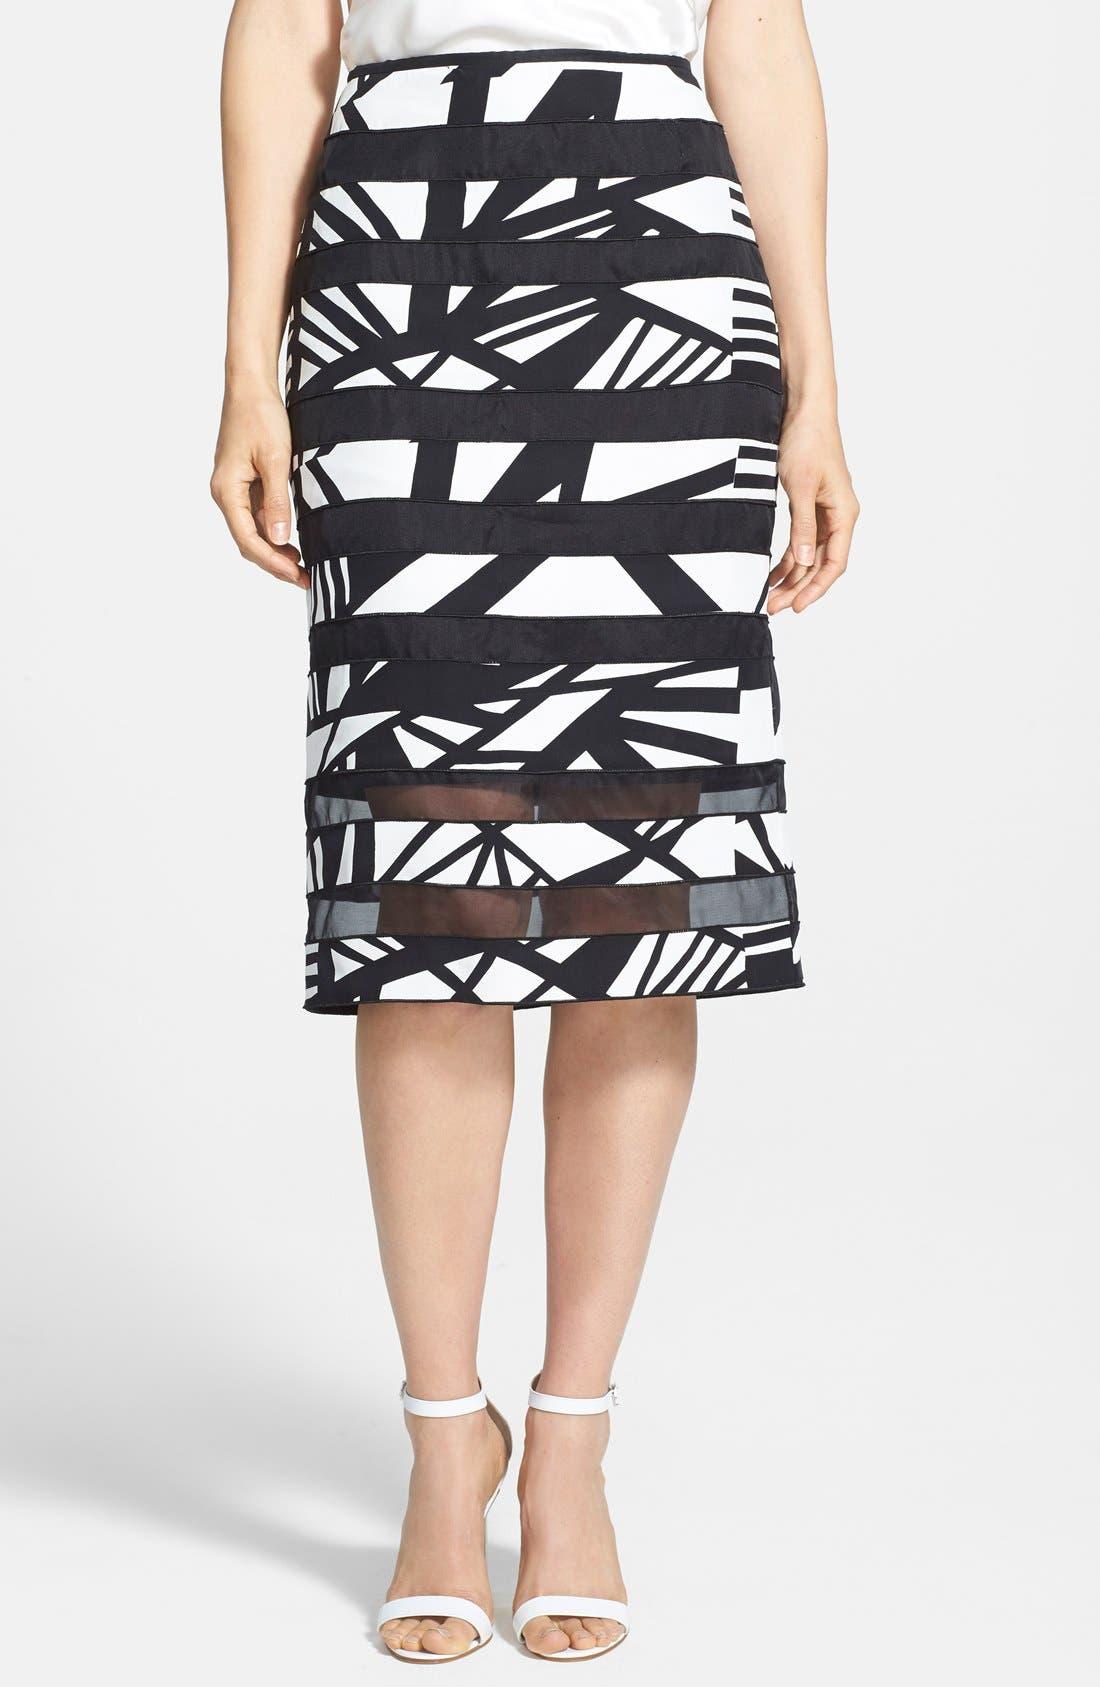 Alternate Image 1 Selected - Lafayette 148 New York 'Modmix' Print Silk Pencil Skirt